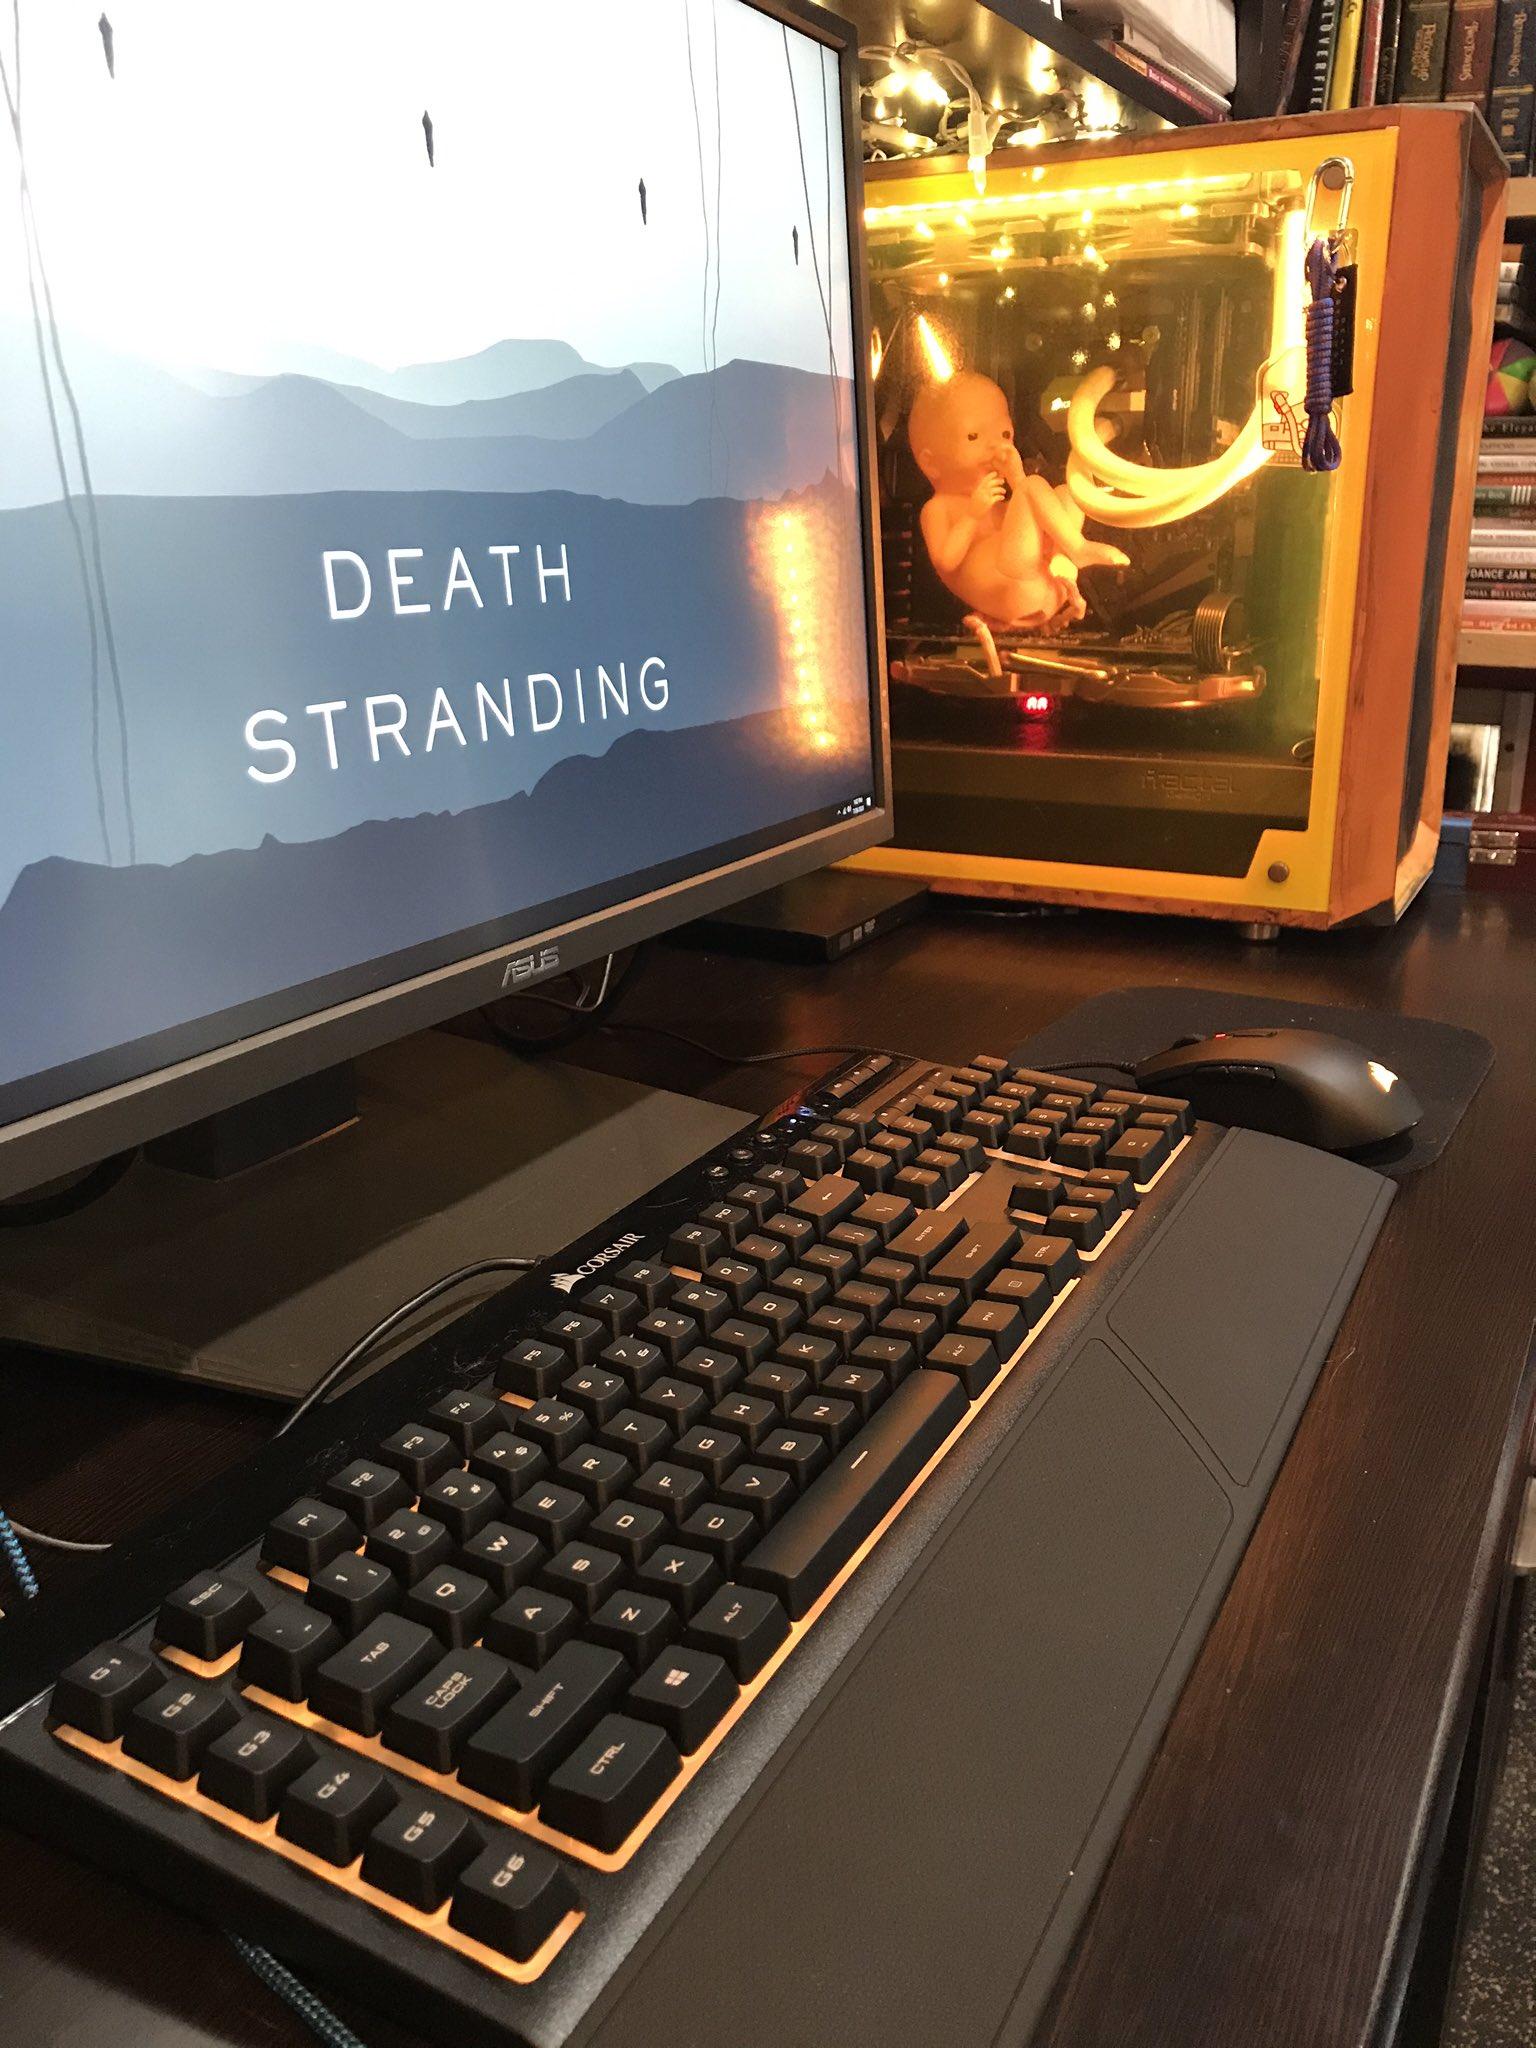 Энтузиаст сделал PC в стиле Death Stranding с милым BB корпусе